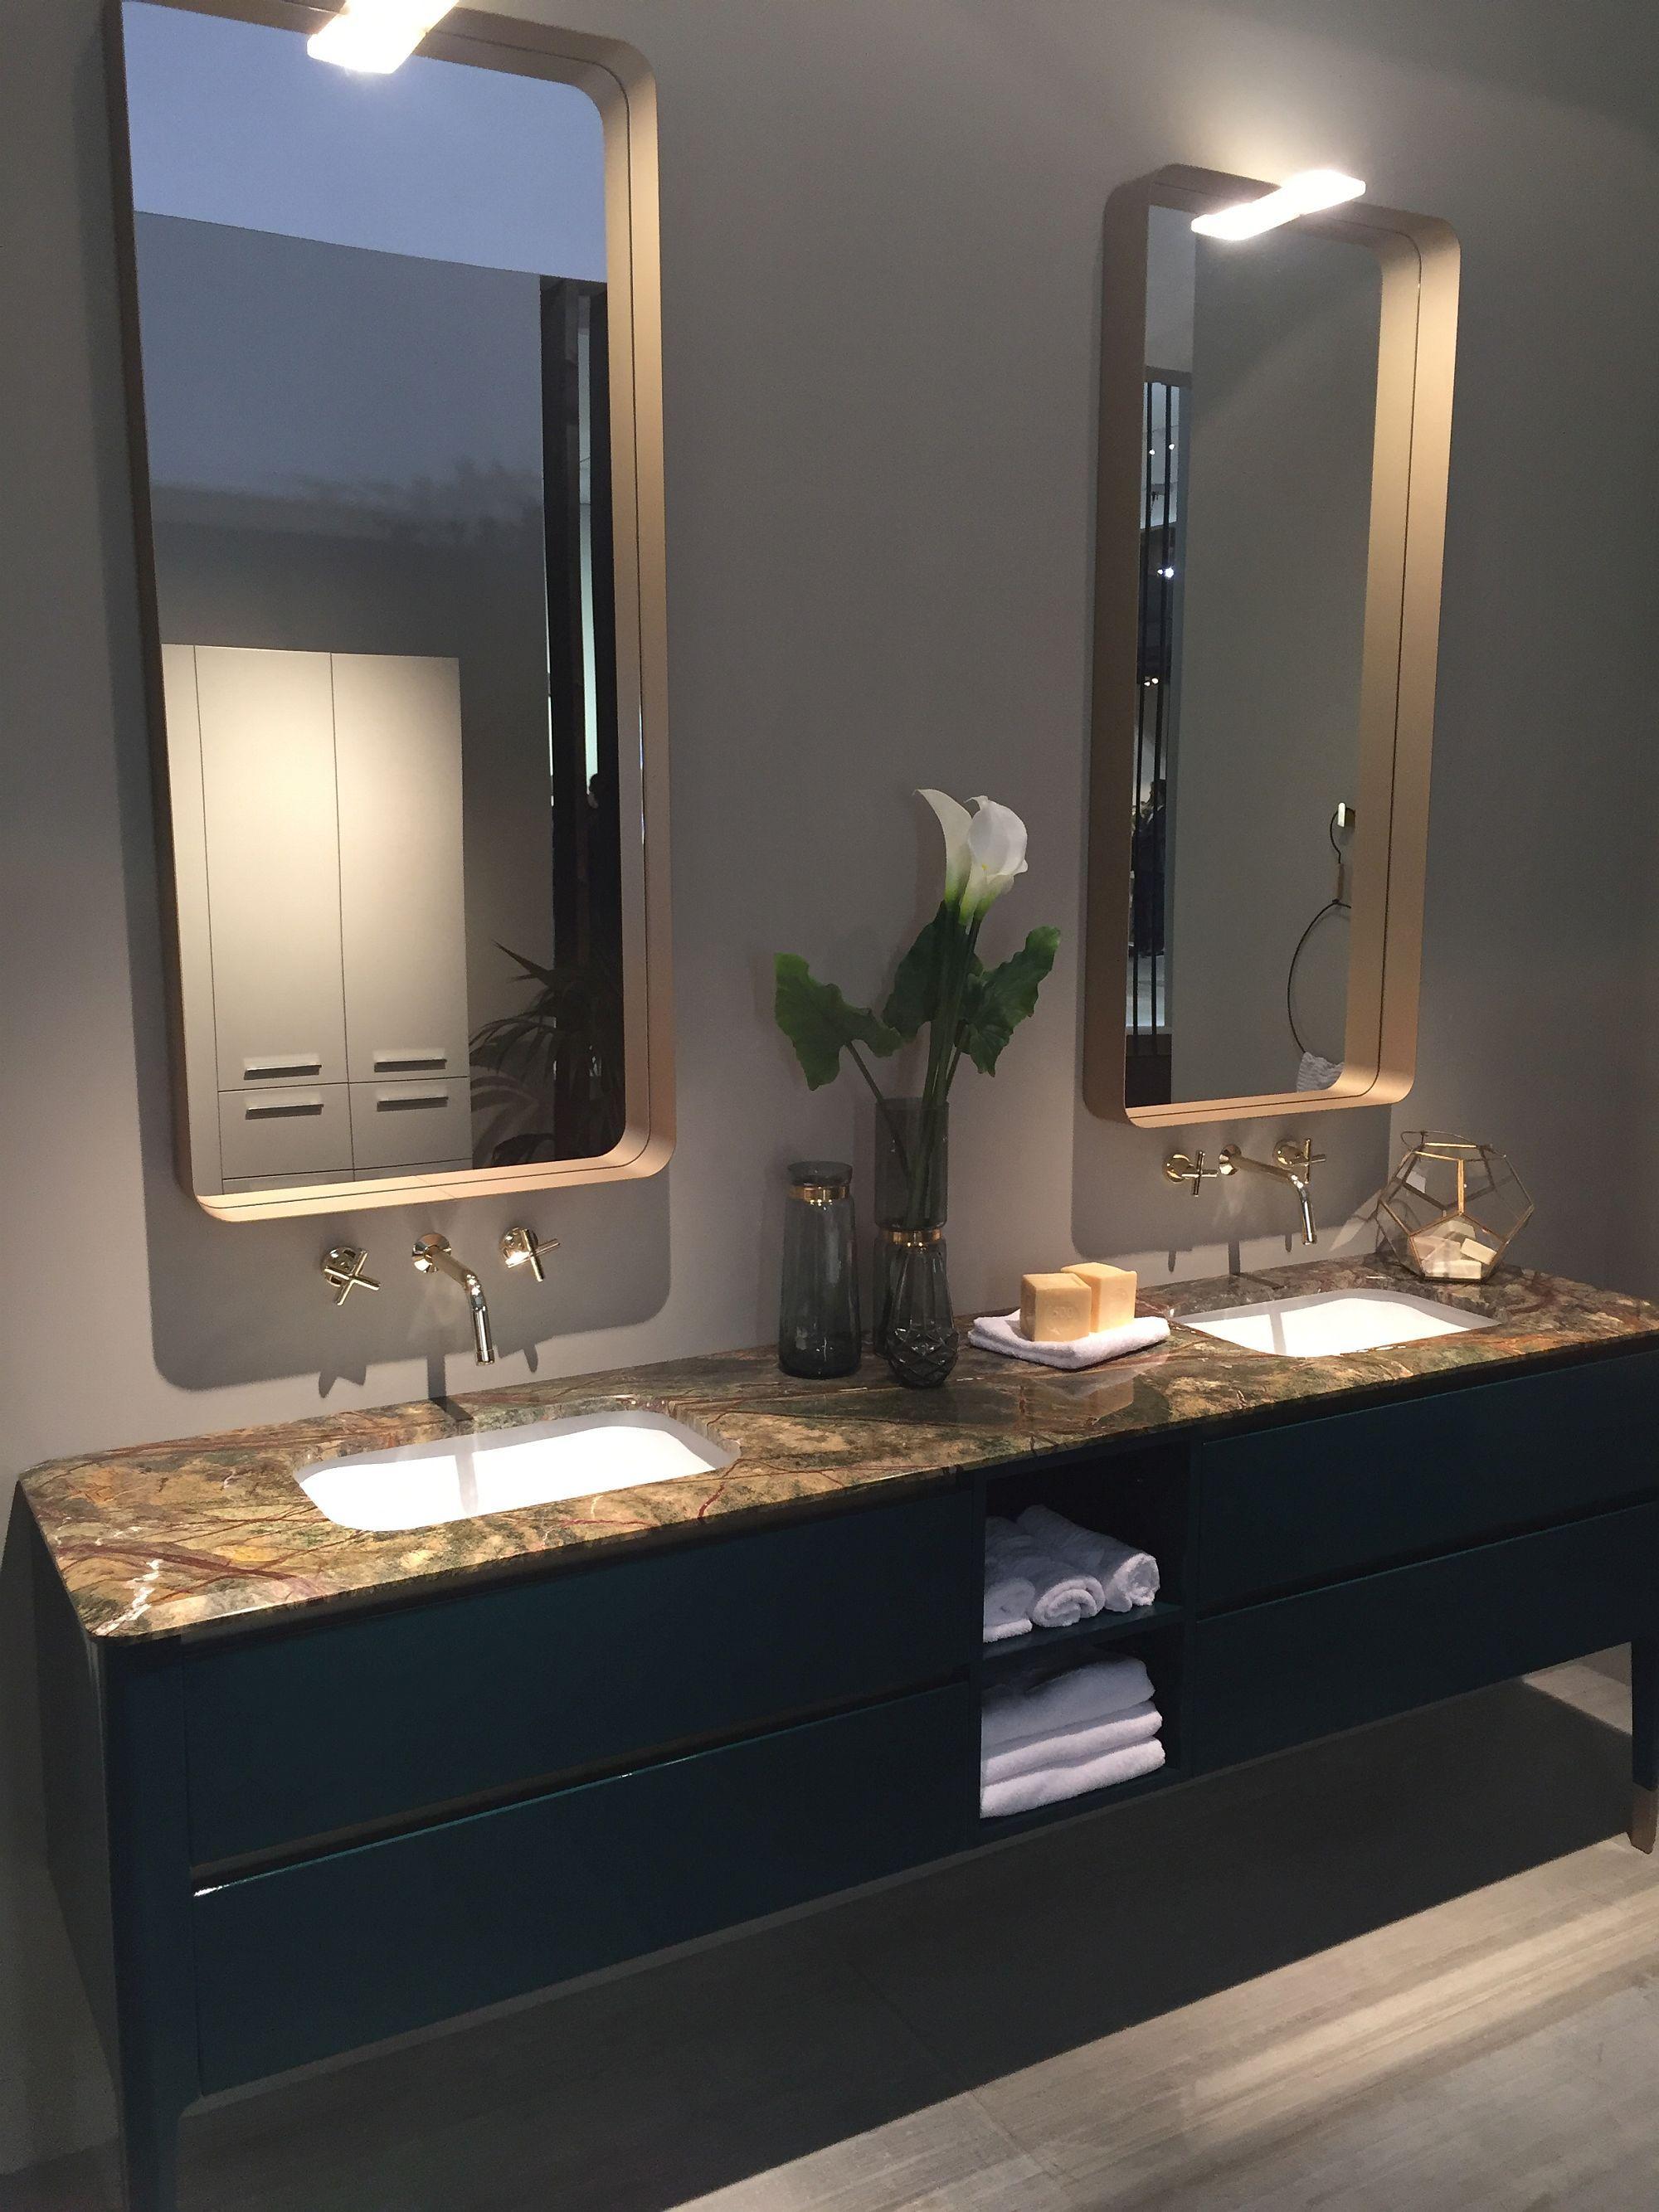 20 Towel Display Ideas For Contemporary Bathrooms Contemporary Bathroom Vanity Modern Bathroom Vanity Modern Bathroom